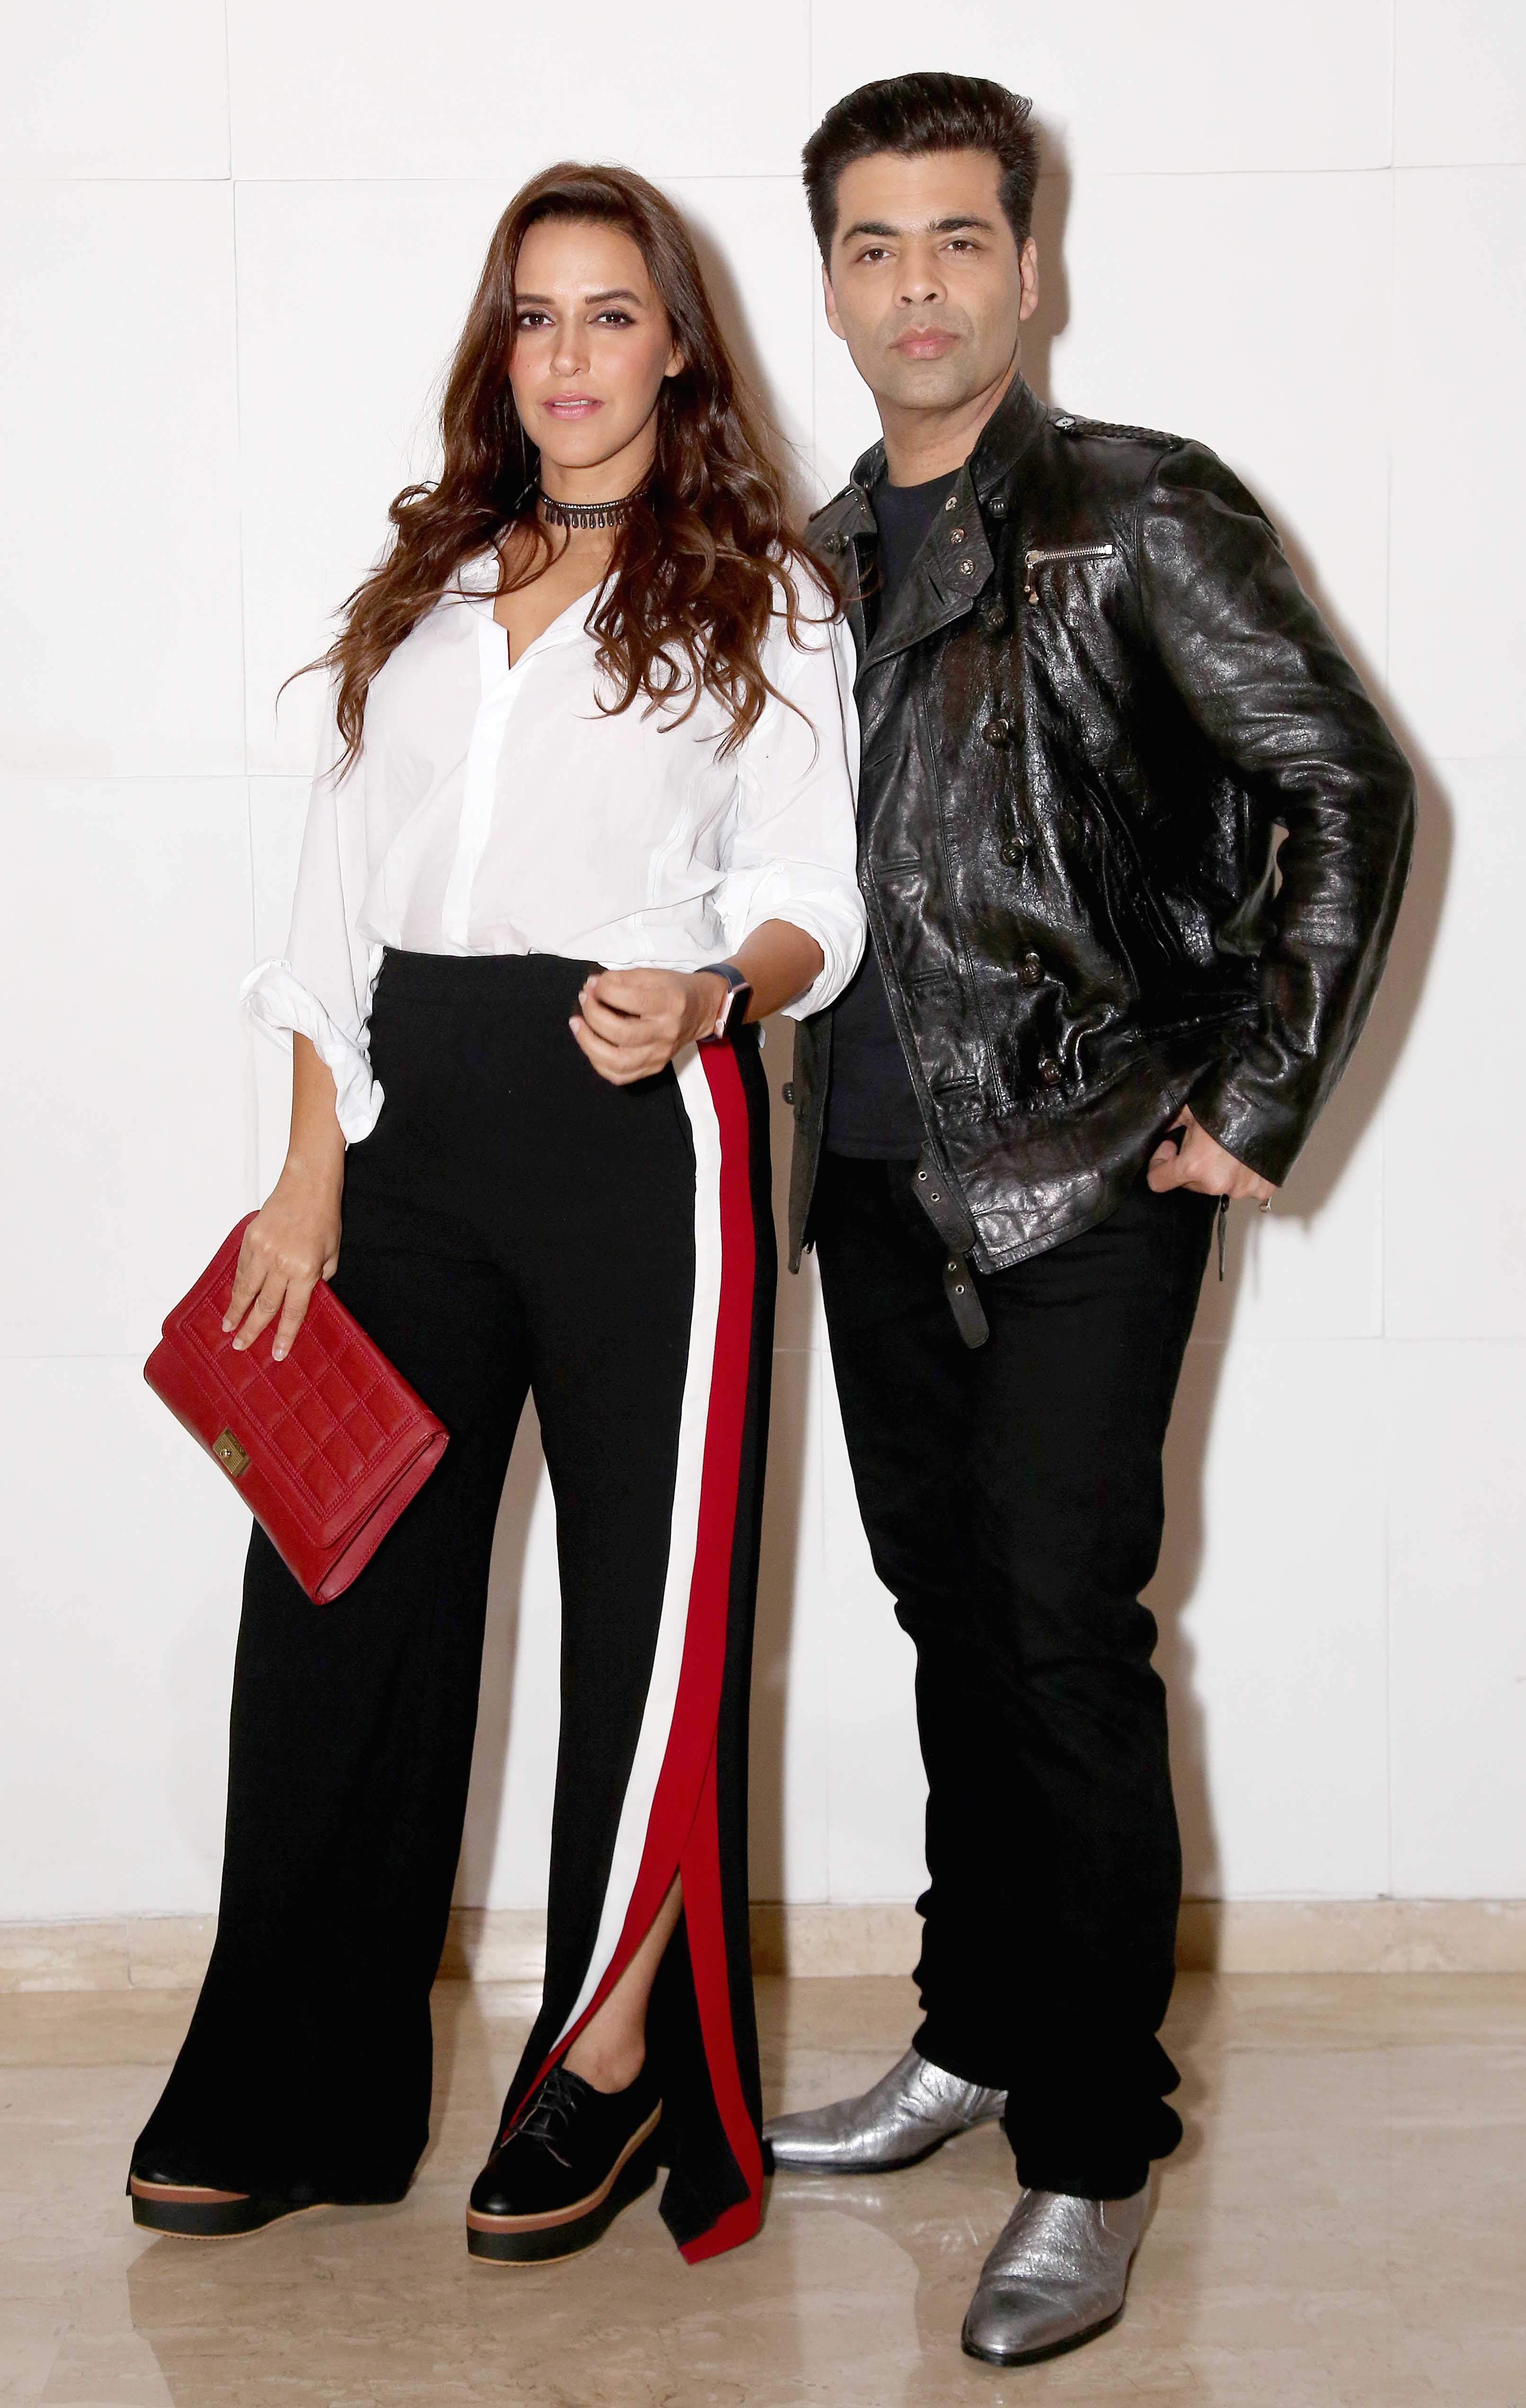 Neha Dhupia and Karan Johar